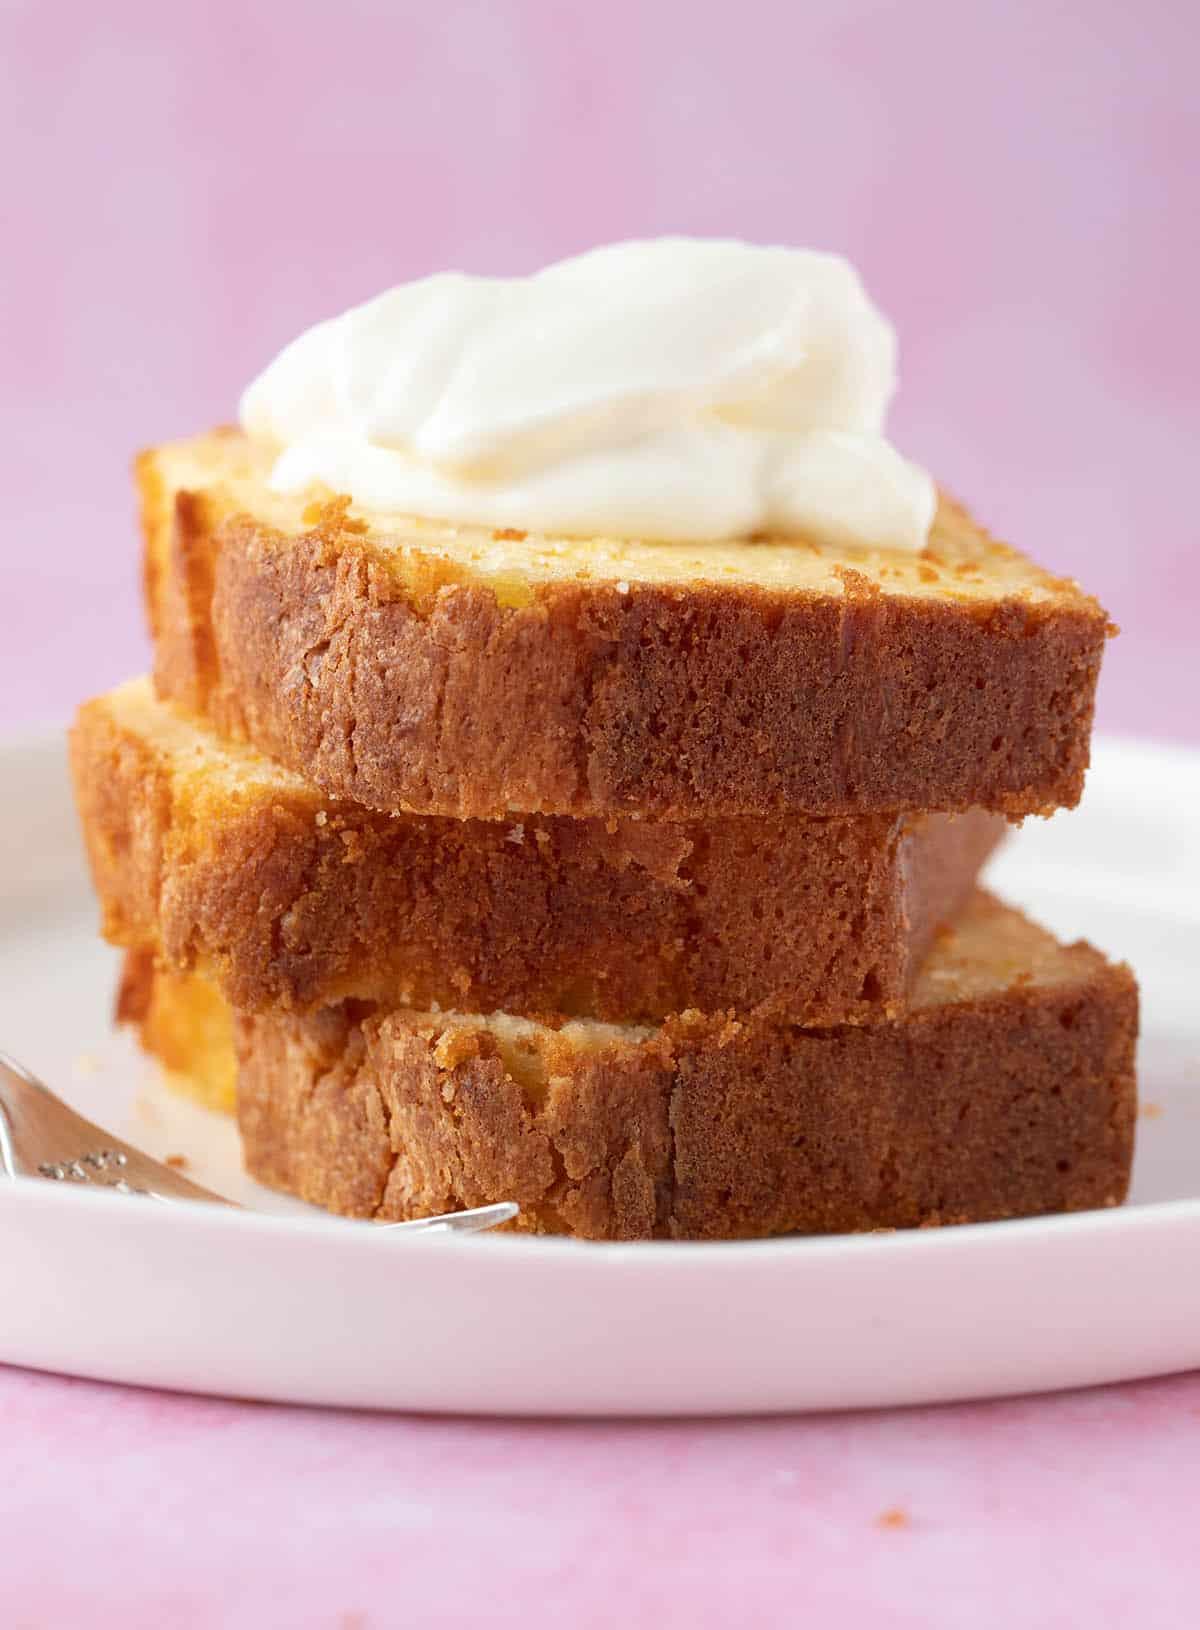 Slices of Gluten Free Orange Cake on a white plate